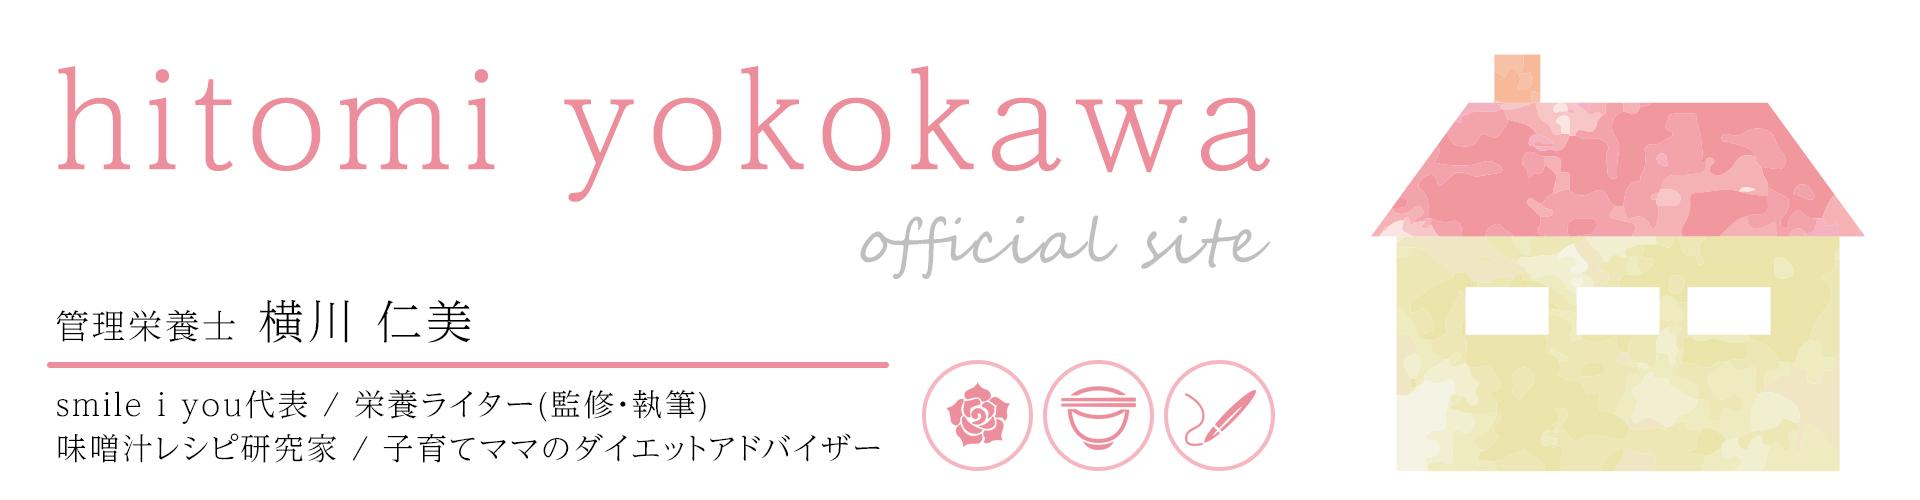 管理栄養士 横川 仁美 公式ブログ